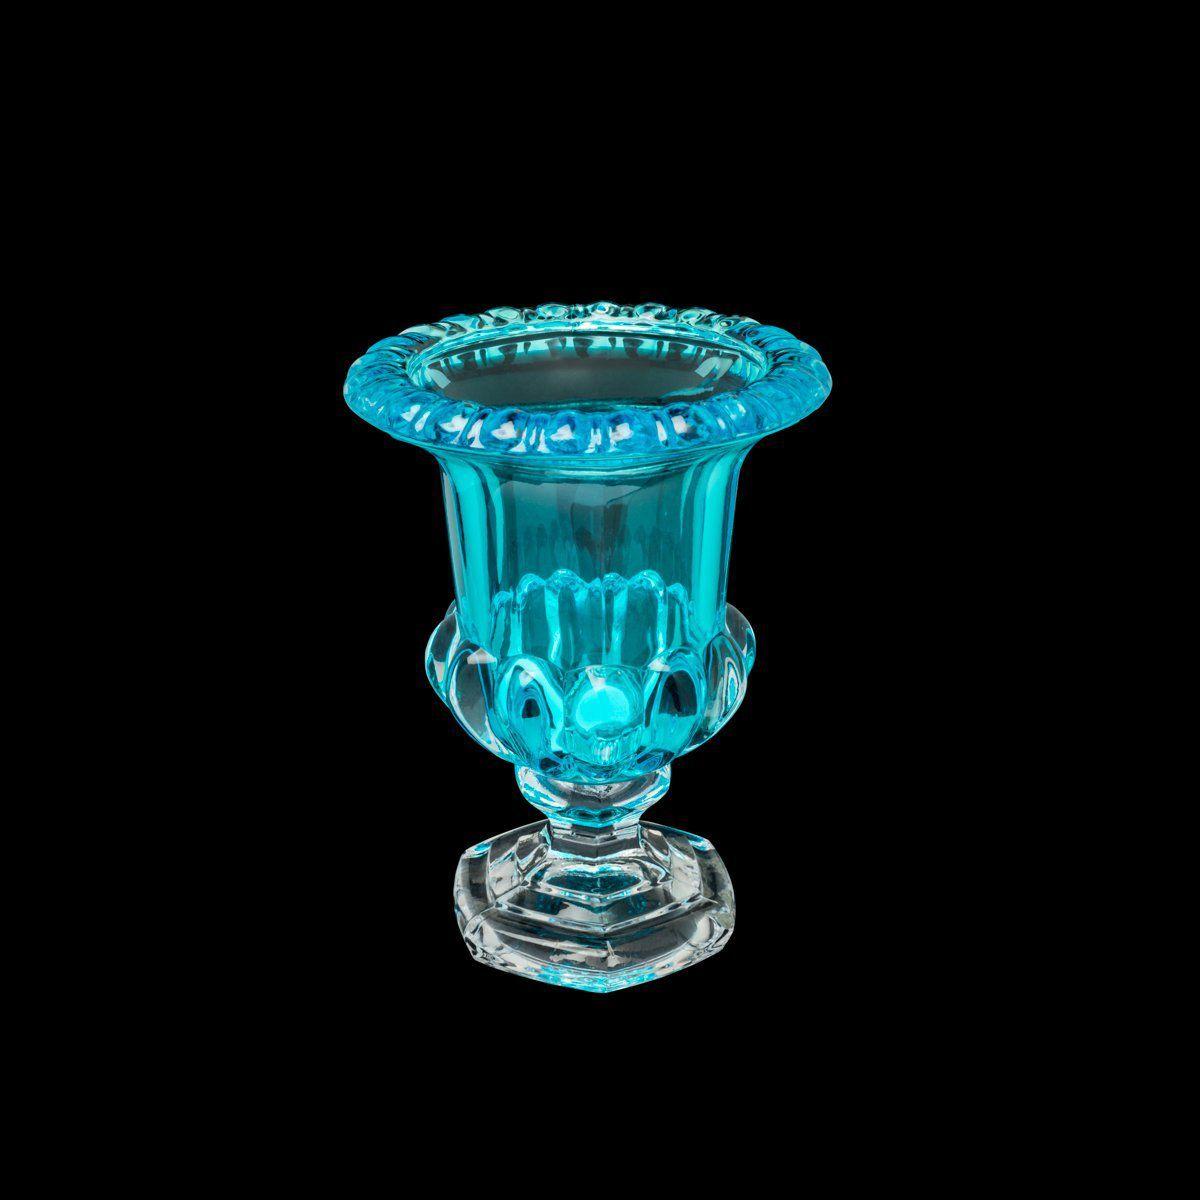 Vaso decorativo 15 cm de cristal turquesa com pé Sussex Wolff - 26461